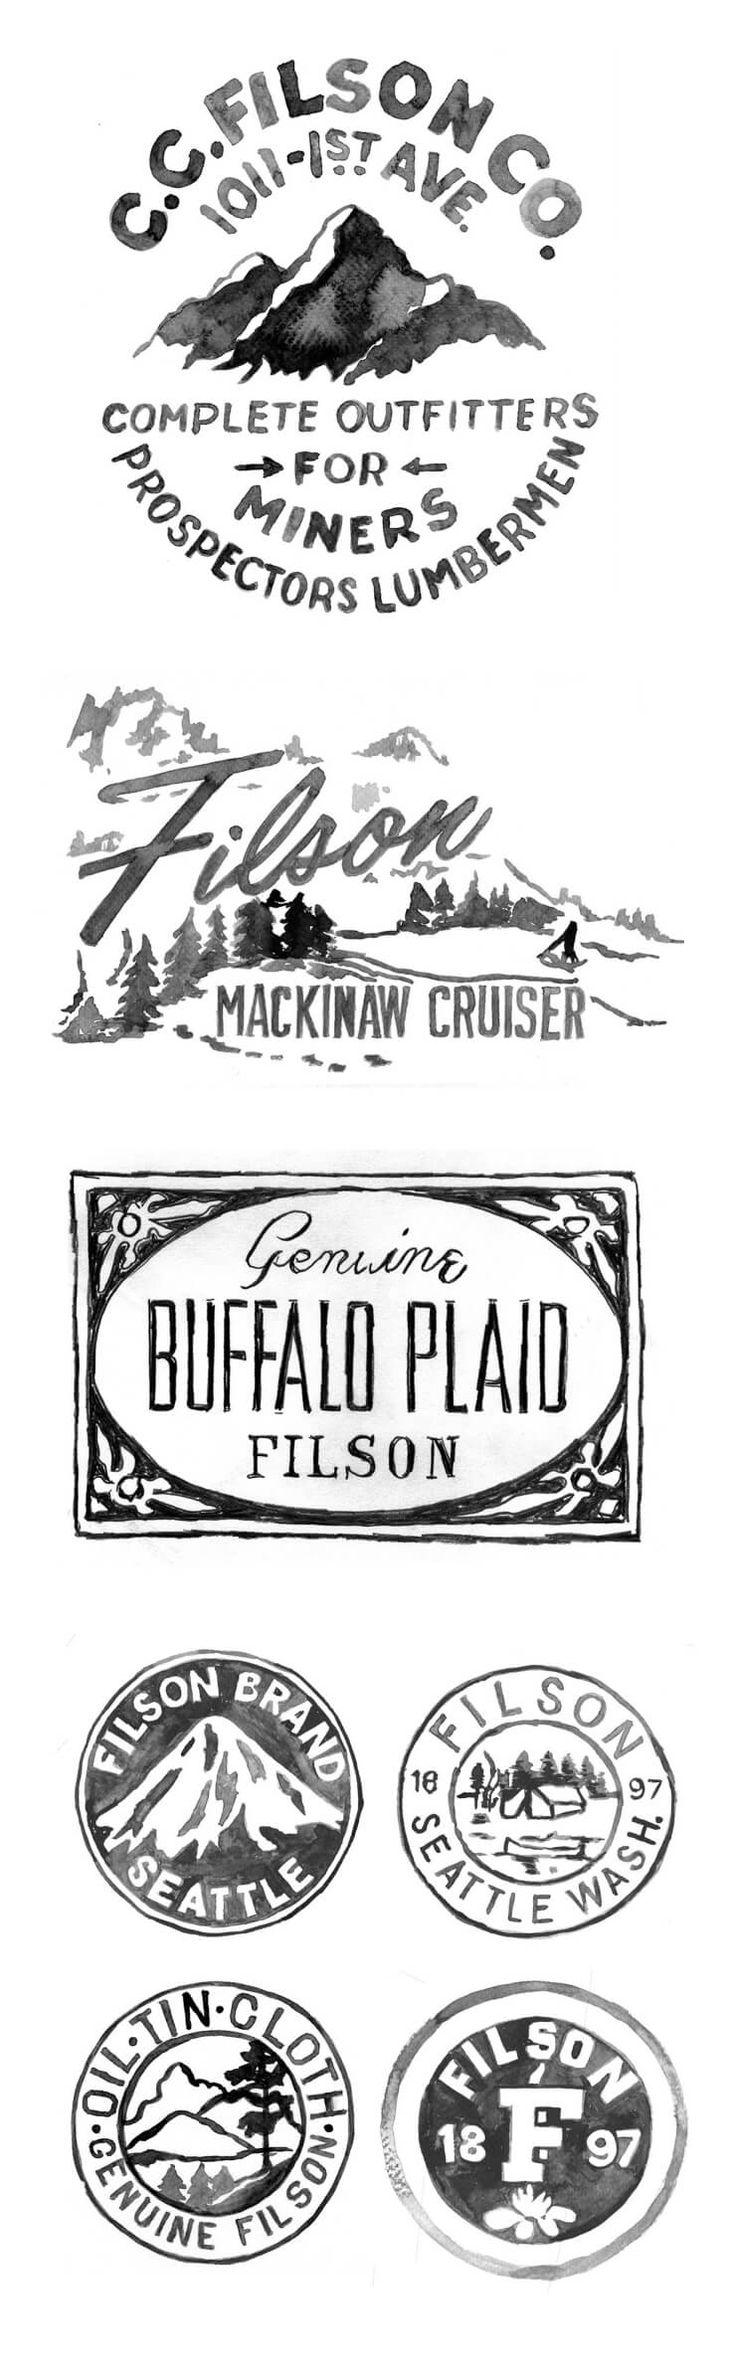 onderste vier ronde logo's